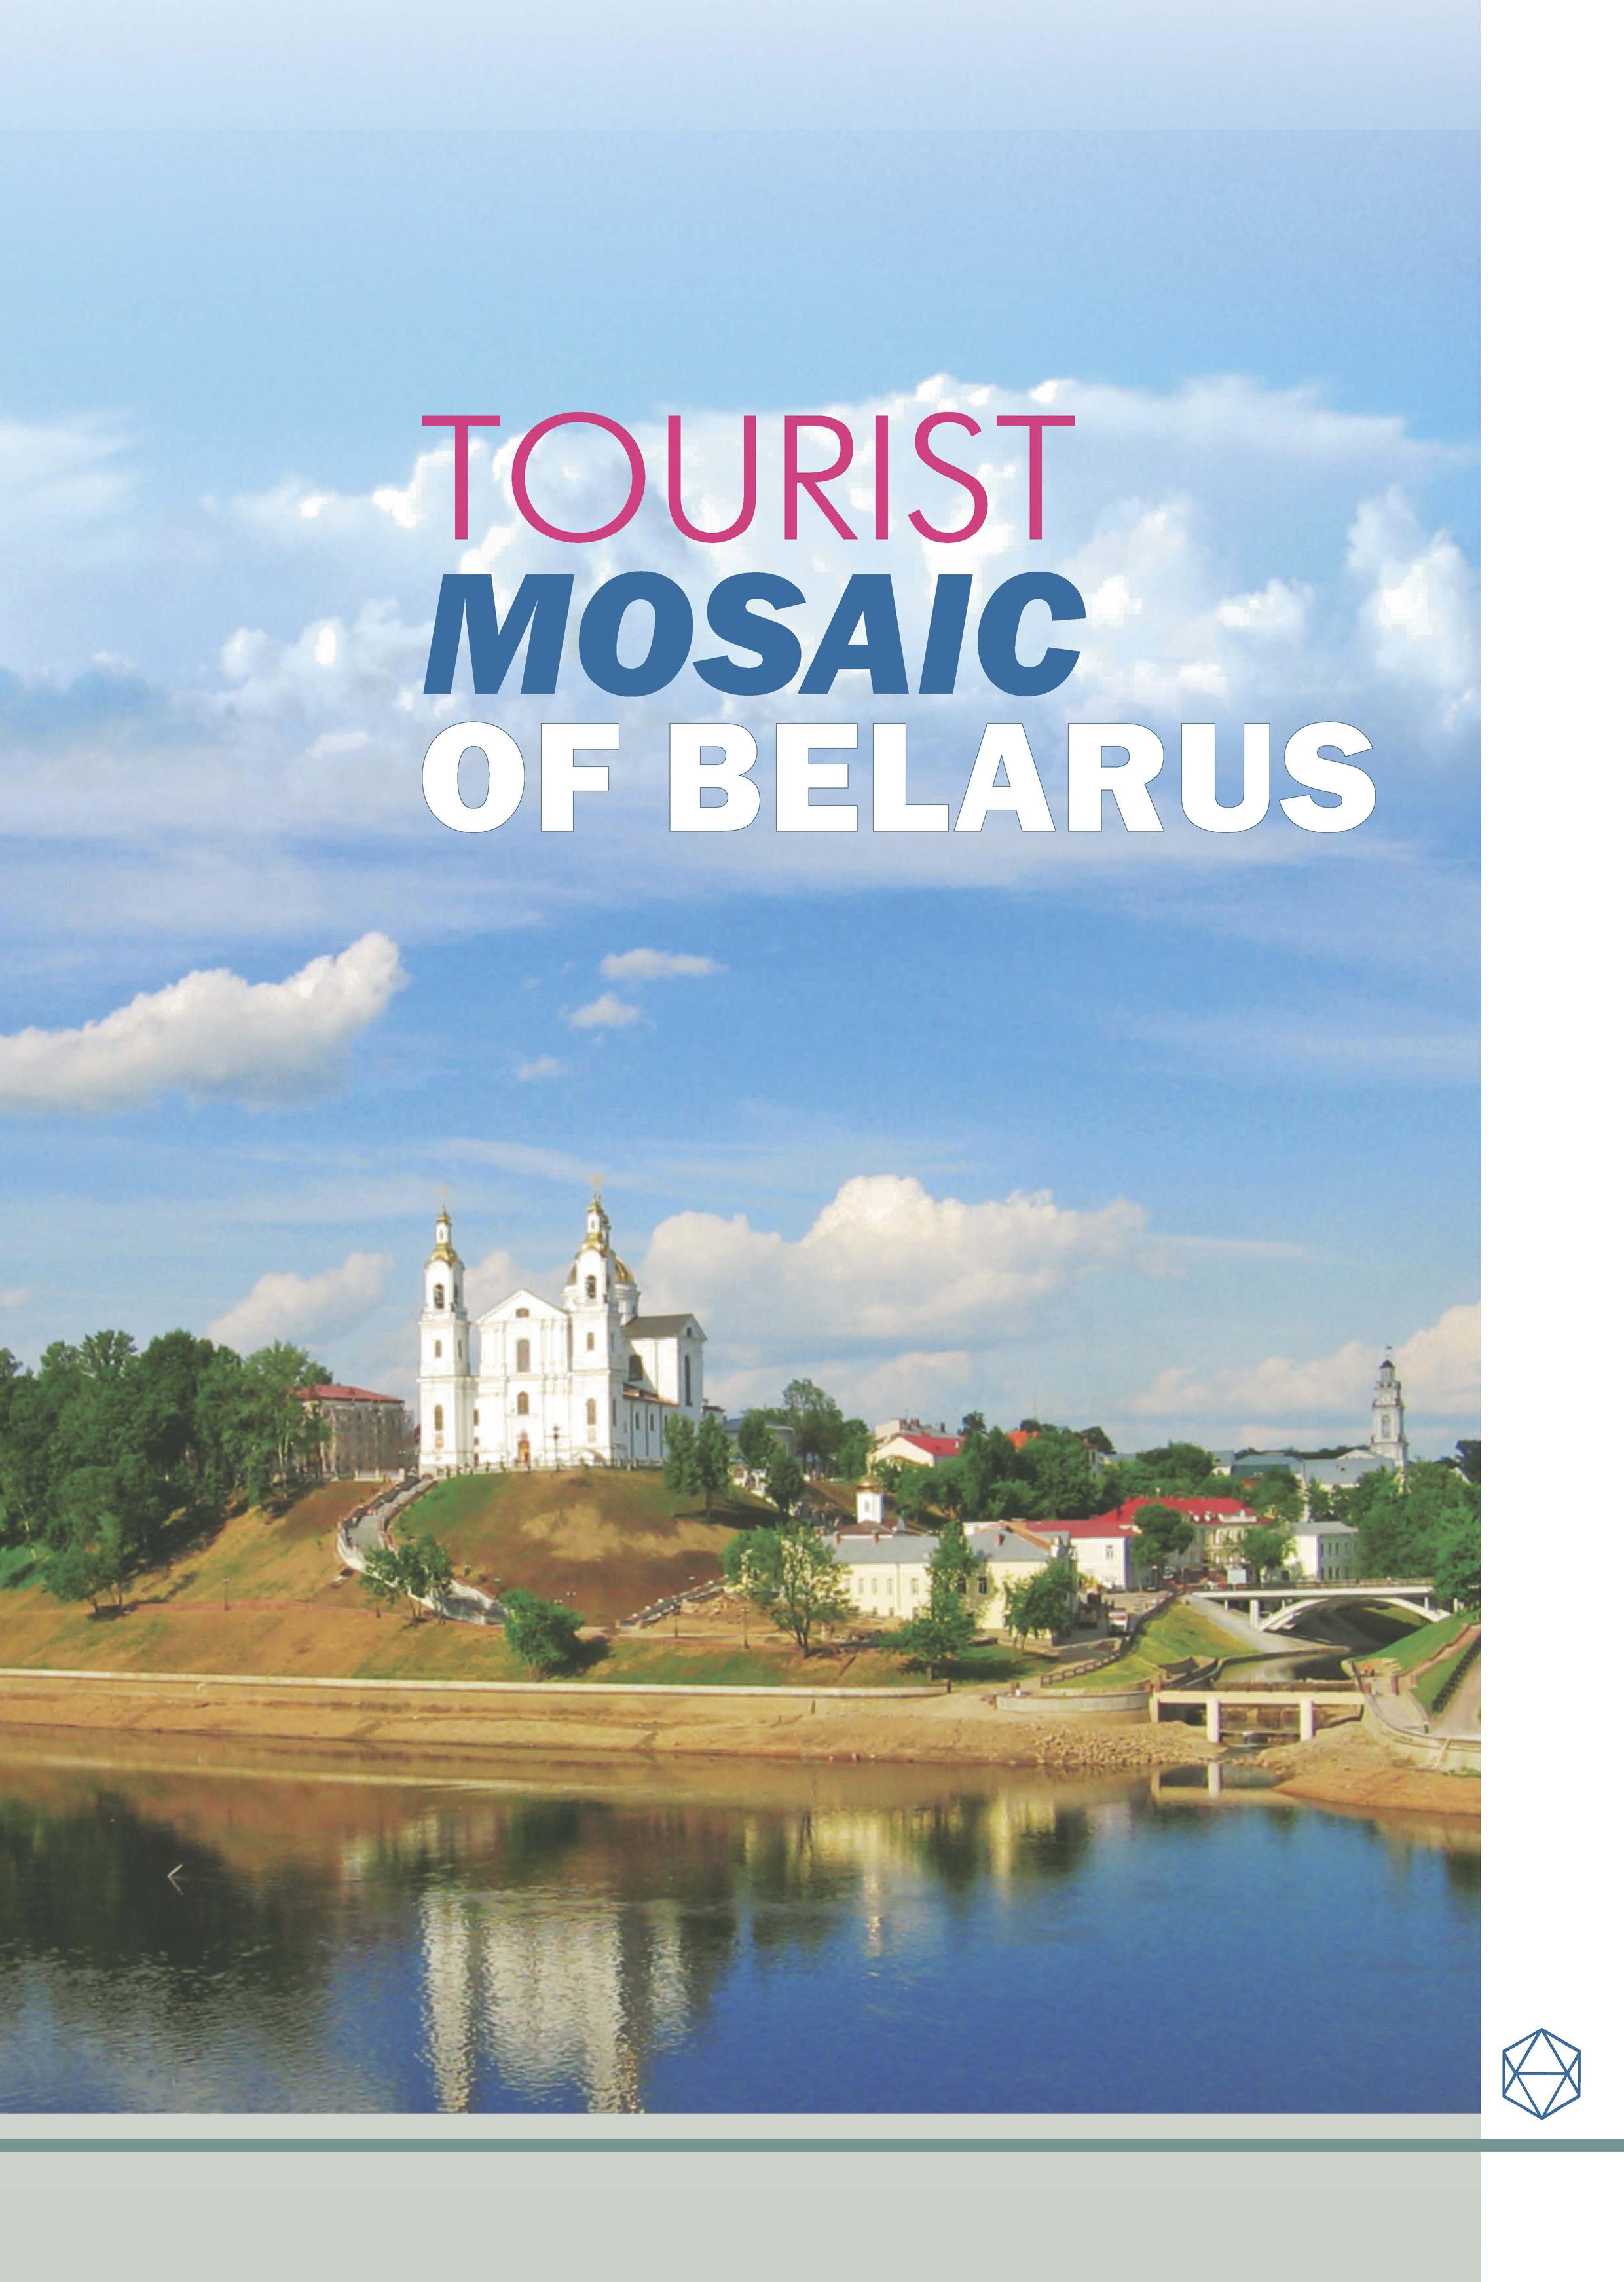 Tourist Mosaic of Belarus